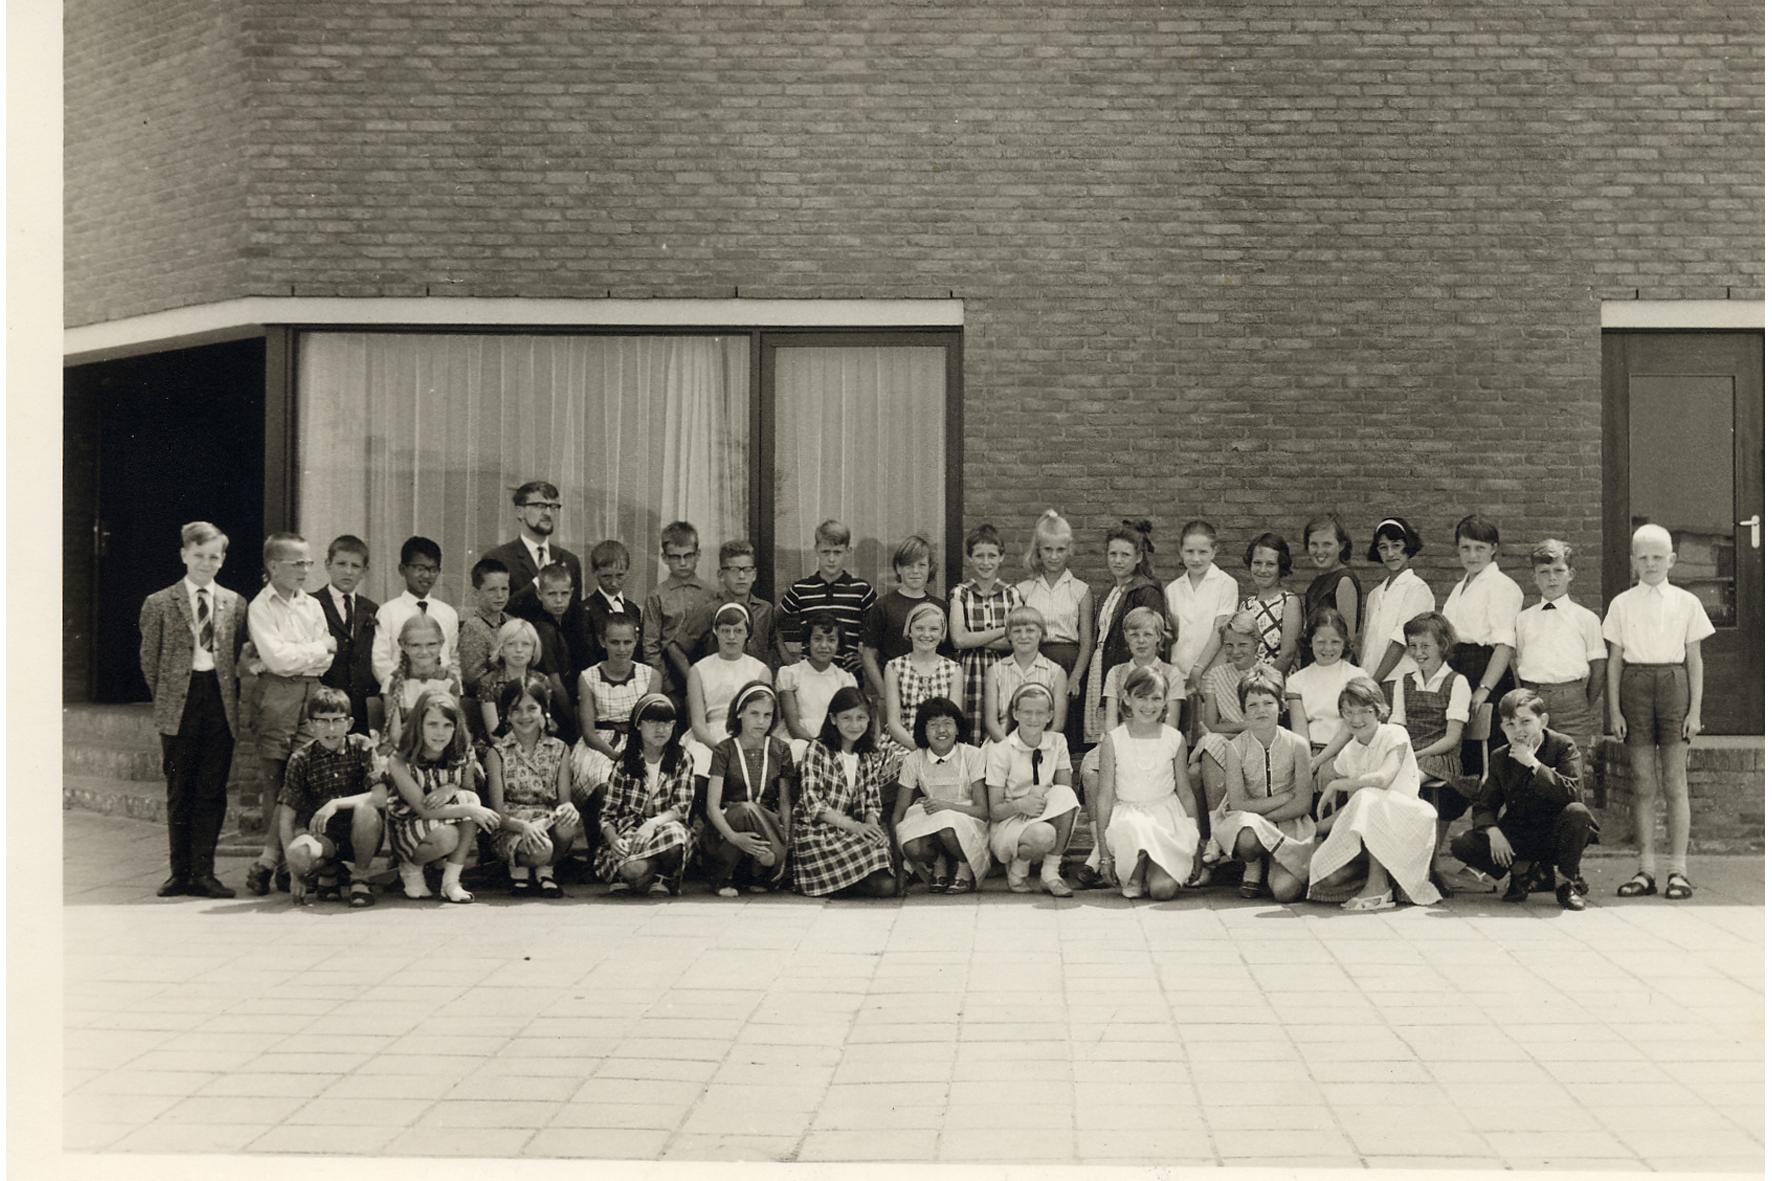 R.K. Lagere school 'St. Paulus' foto